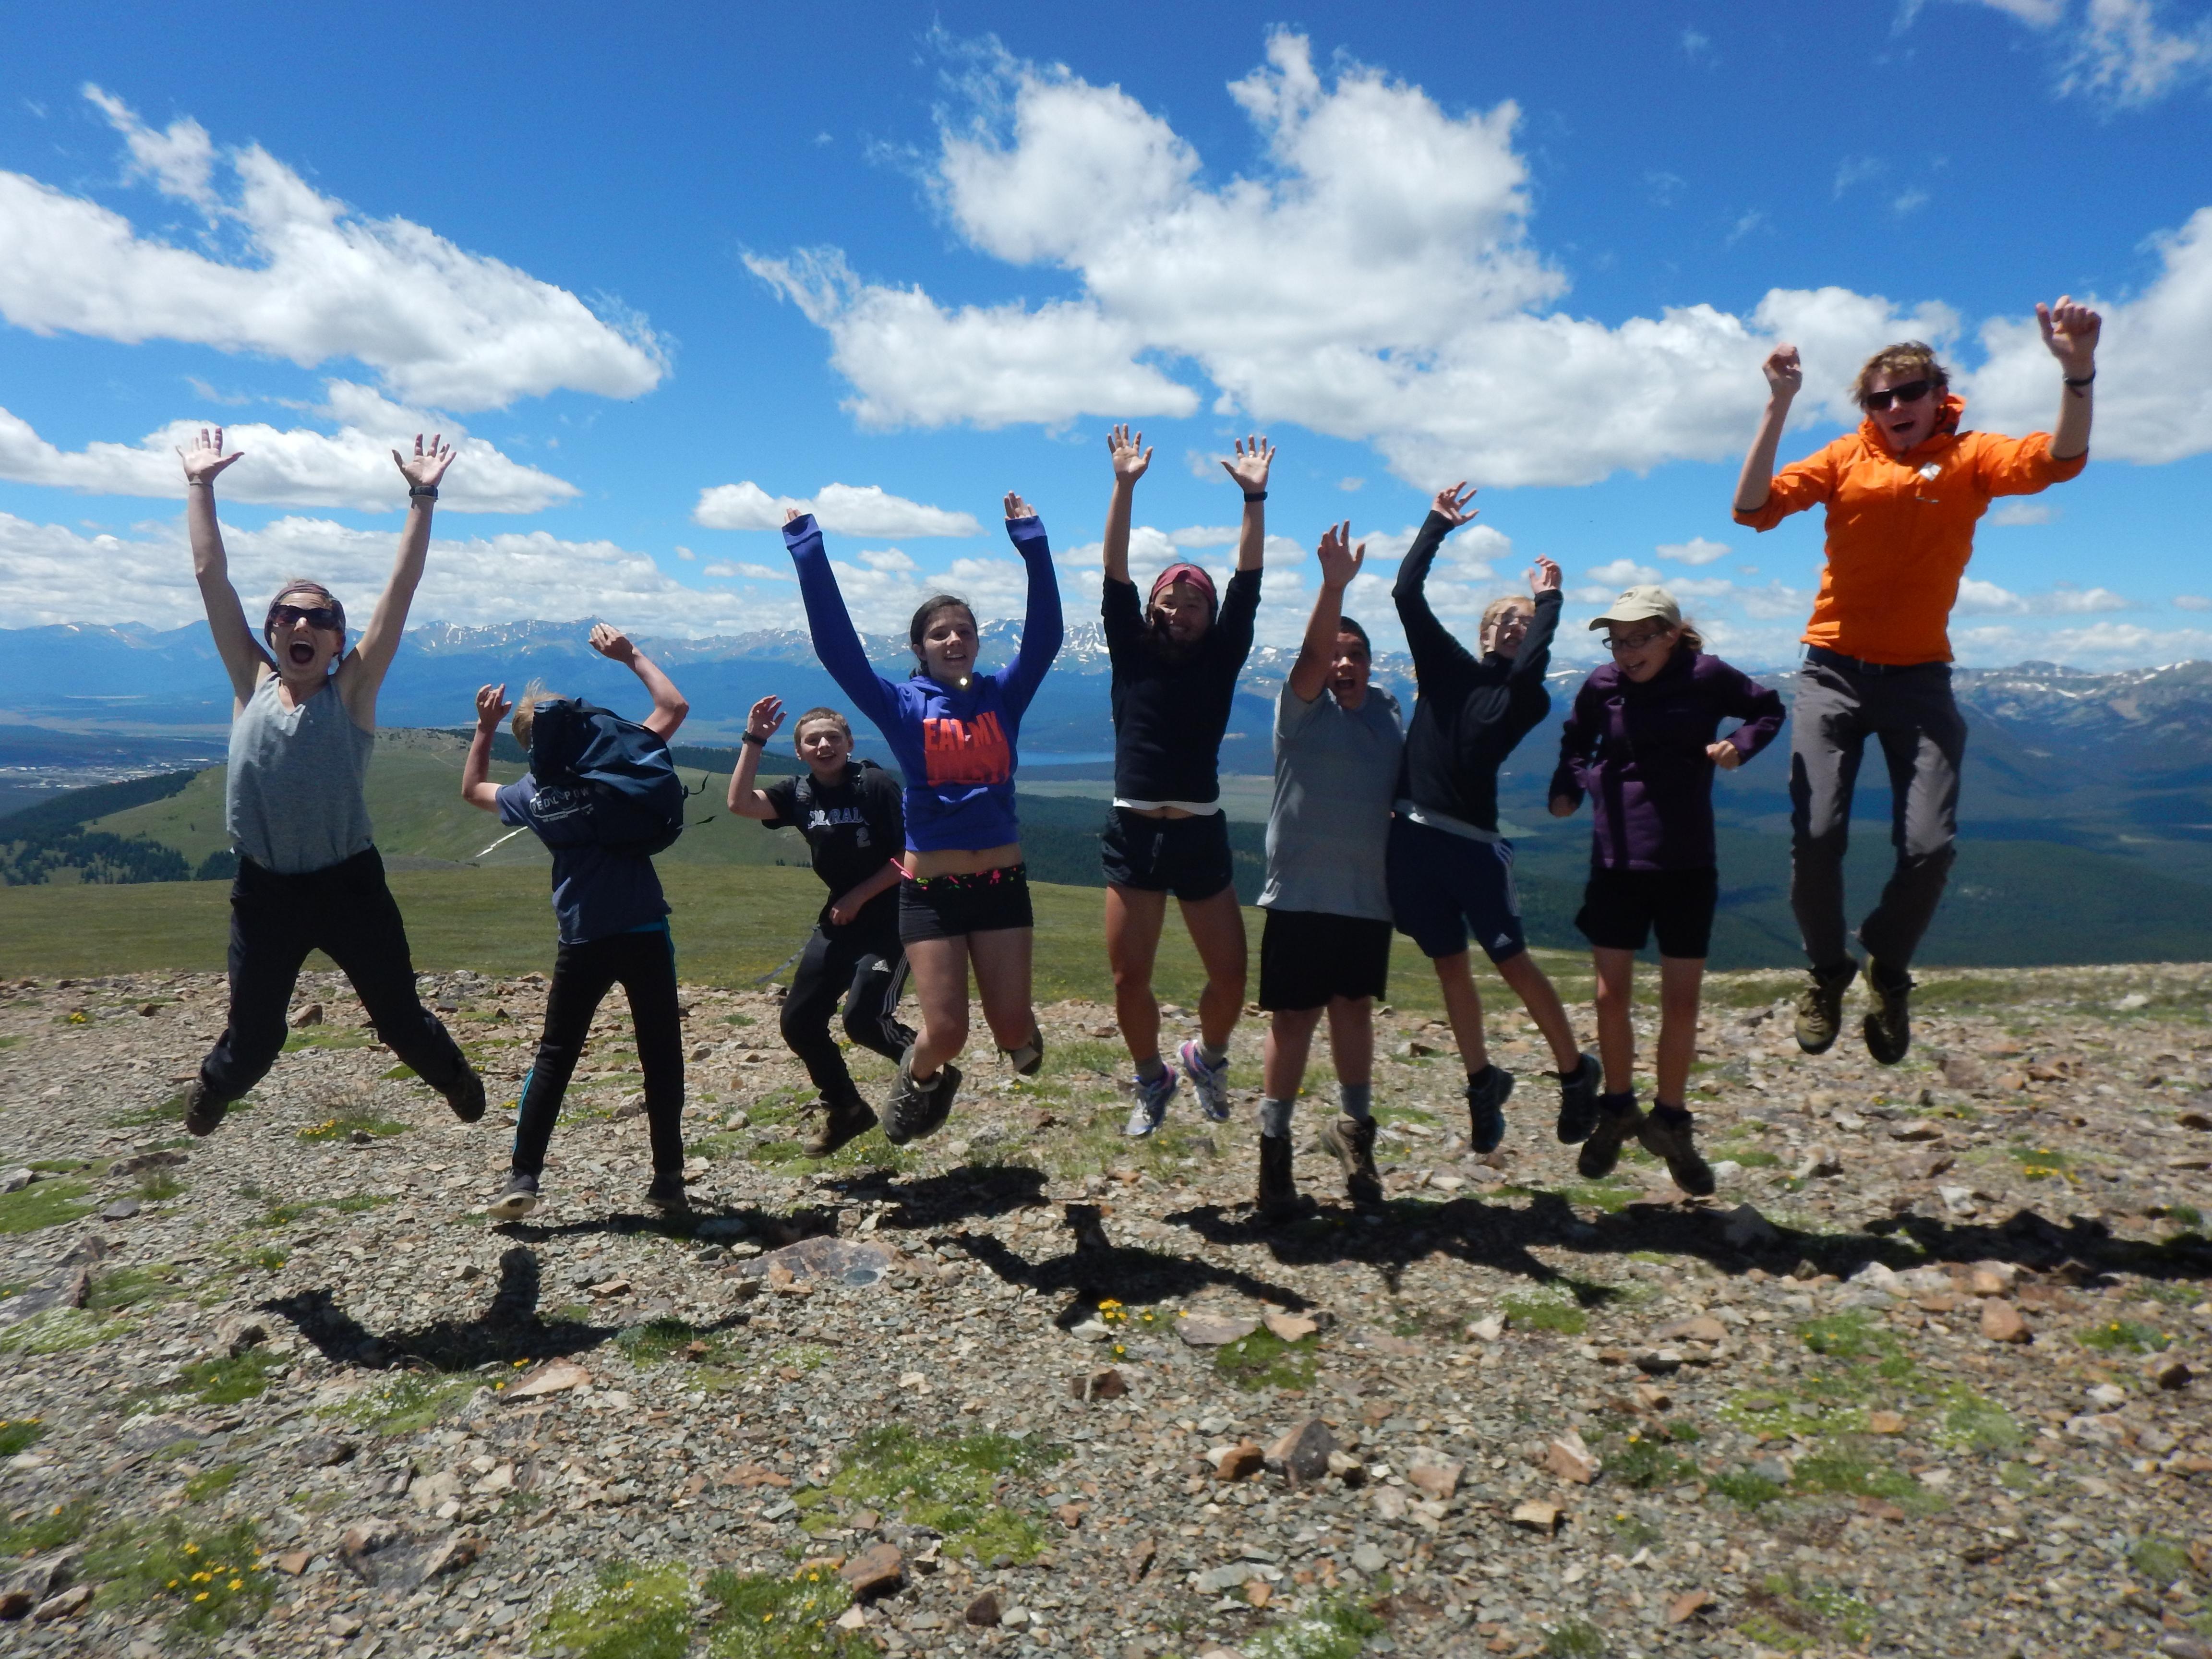 Summer Program - Hiking | High Mountain Institute: High Peaks Adventure